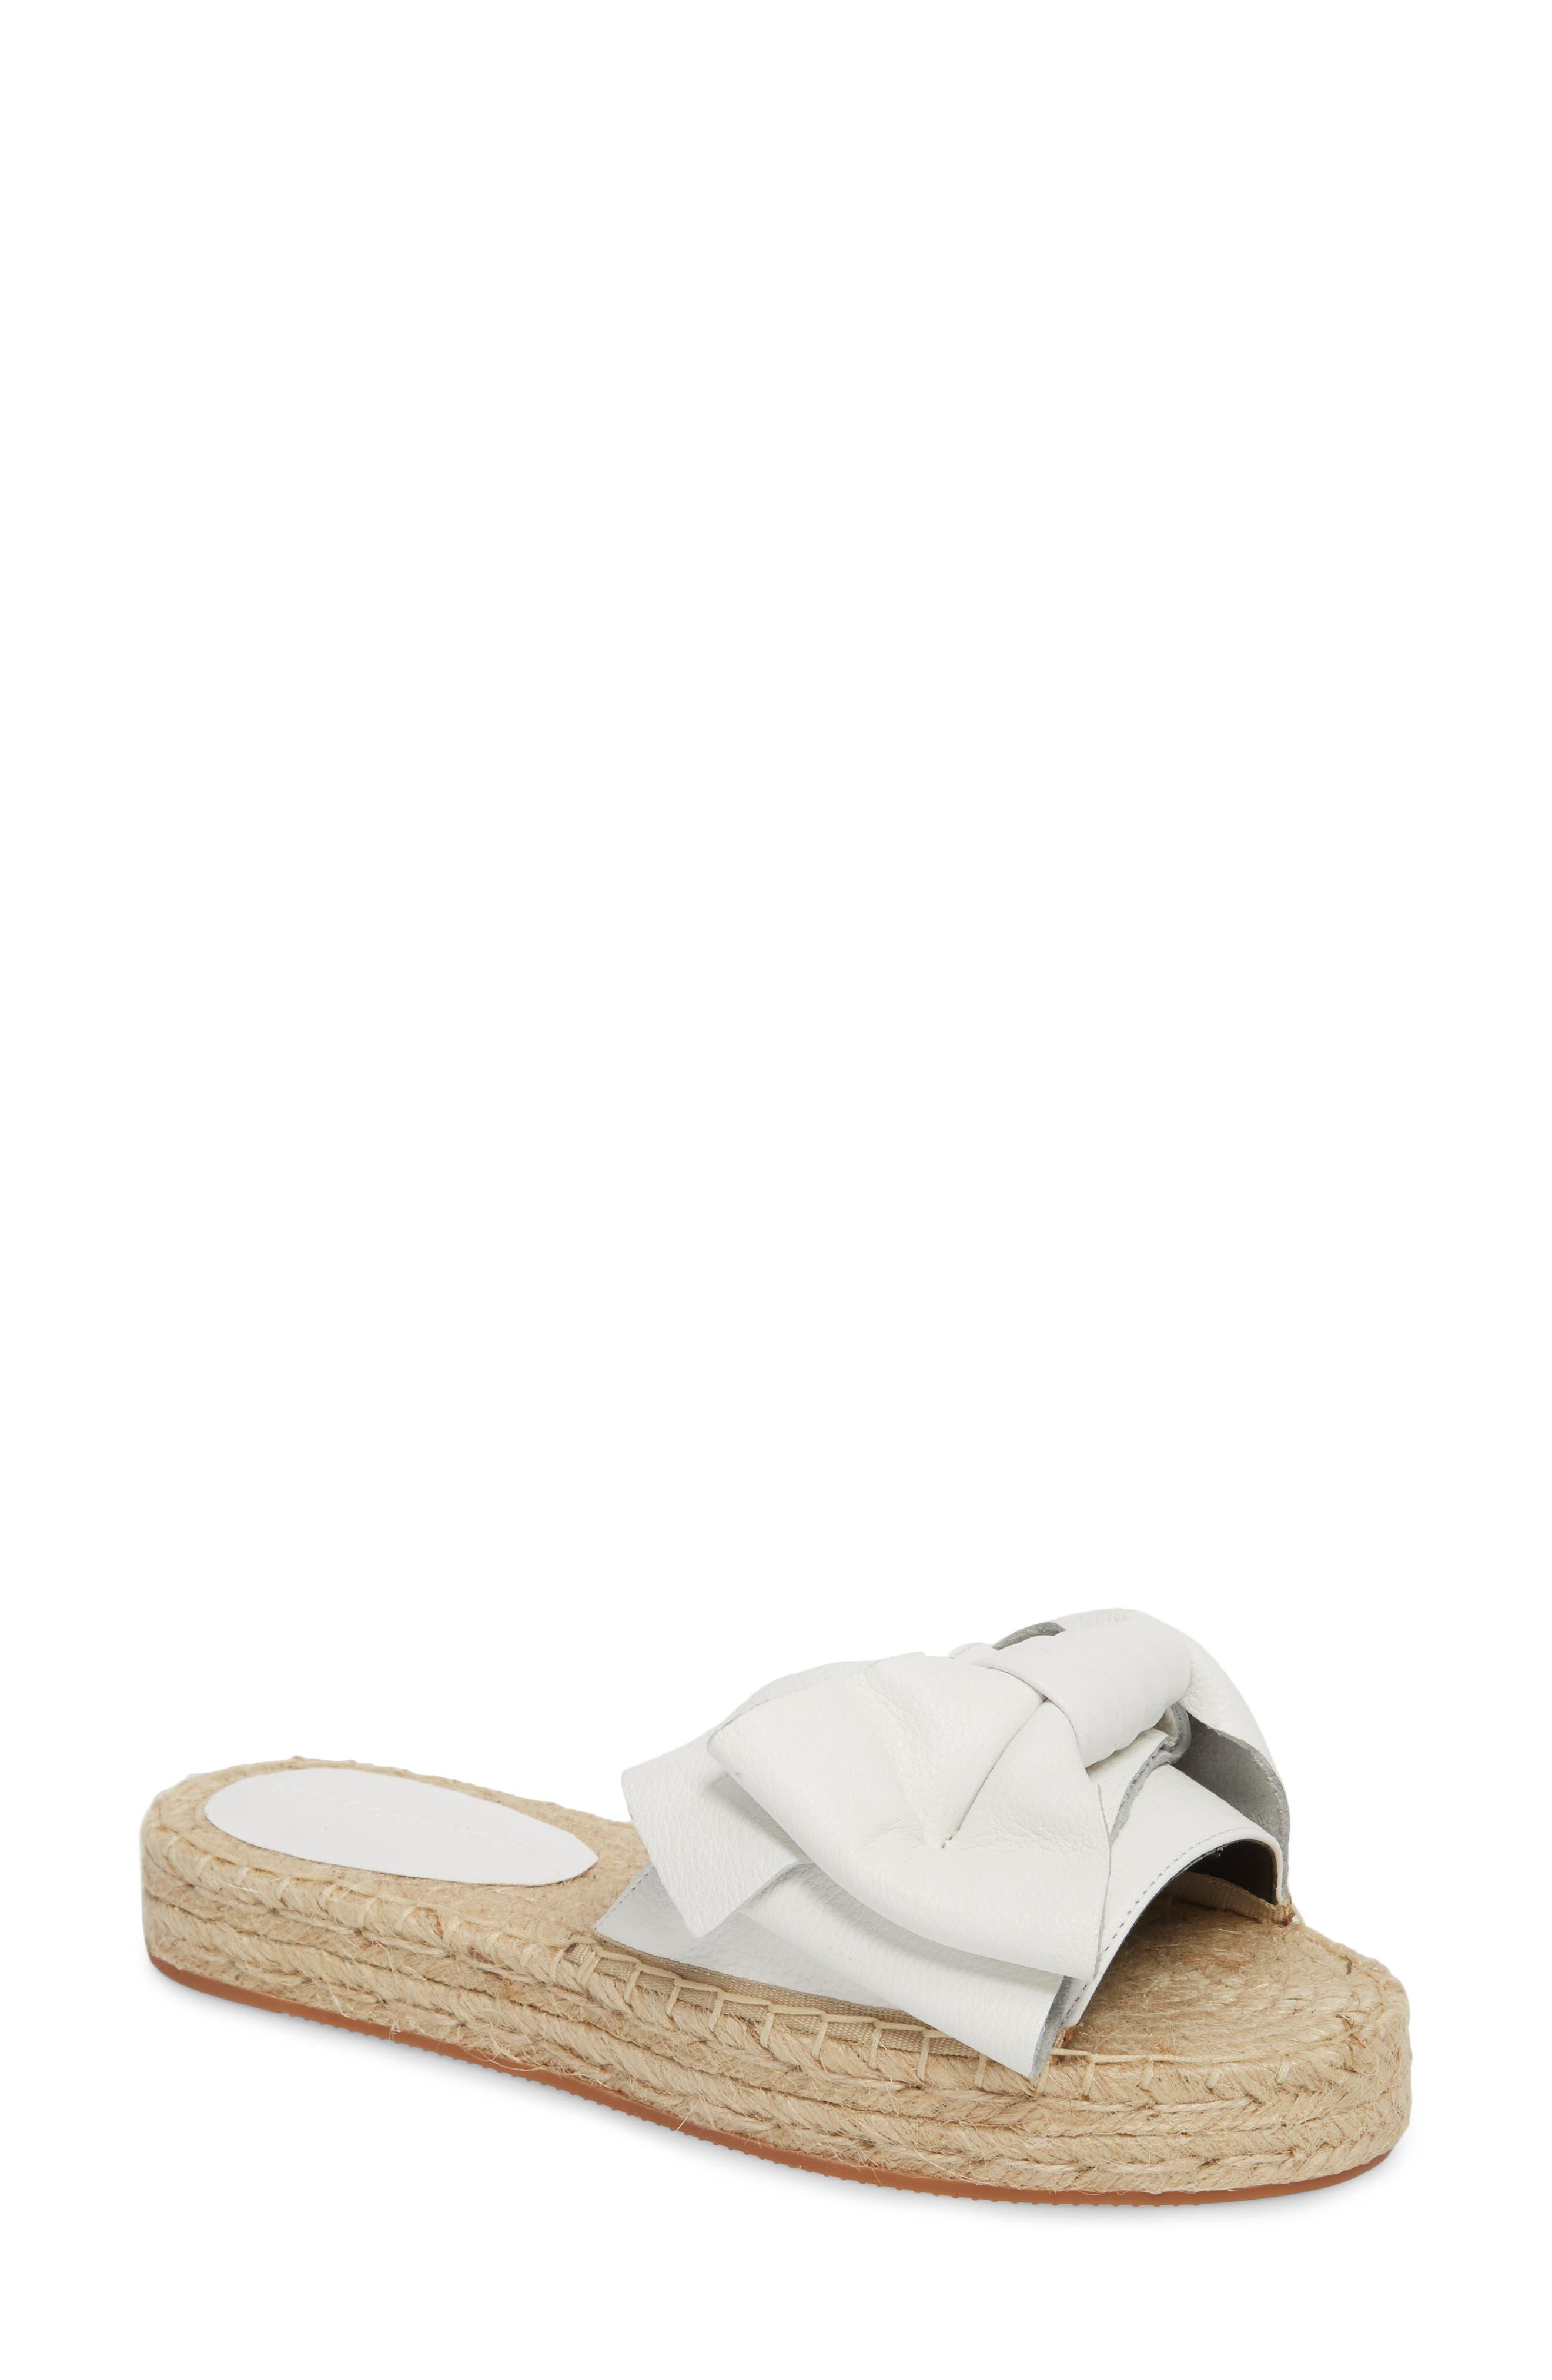 Giana Bow Slide Sandal,                         Main,                         color, Optic White Leather